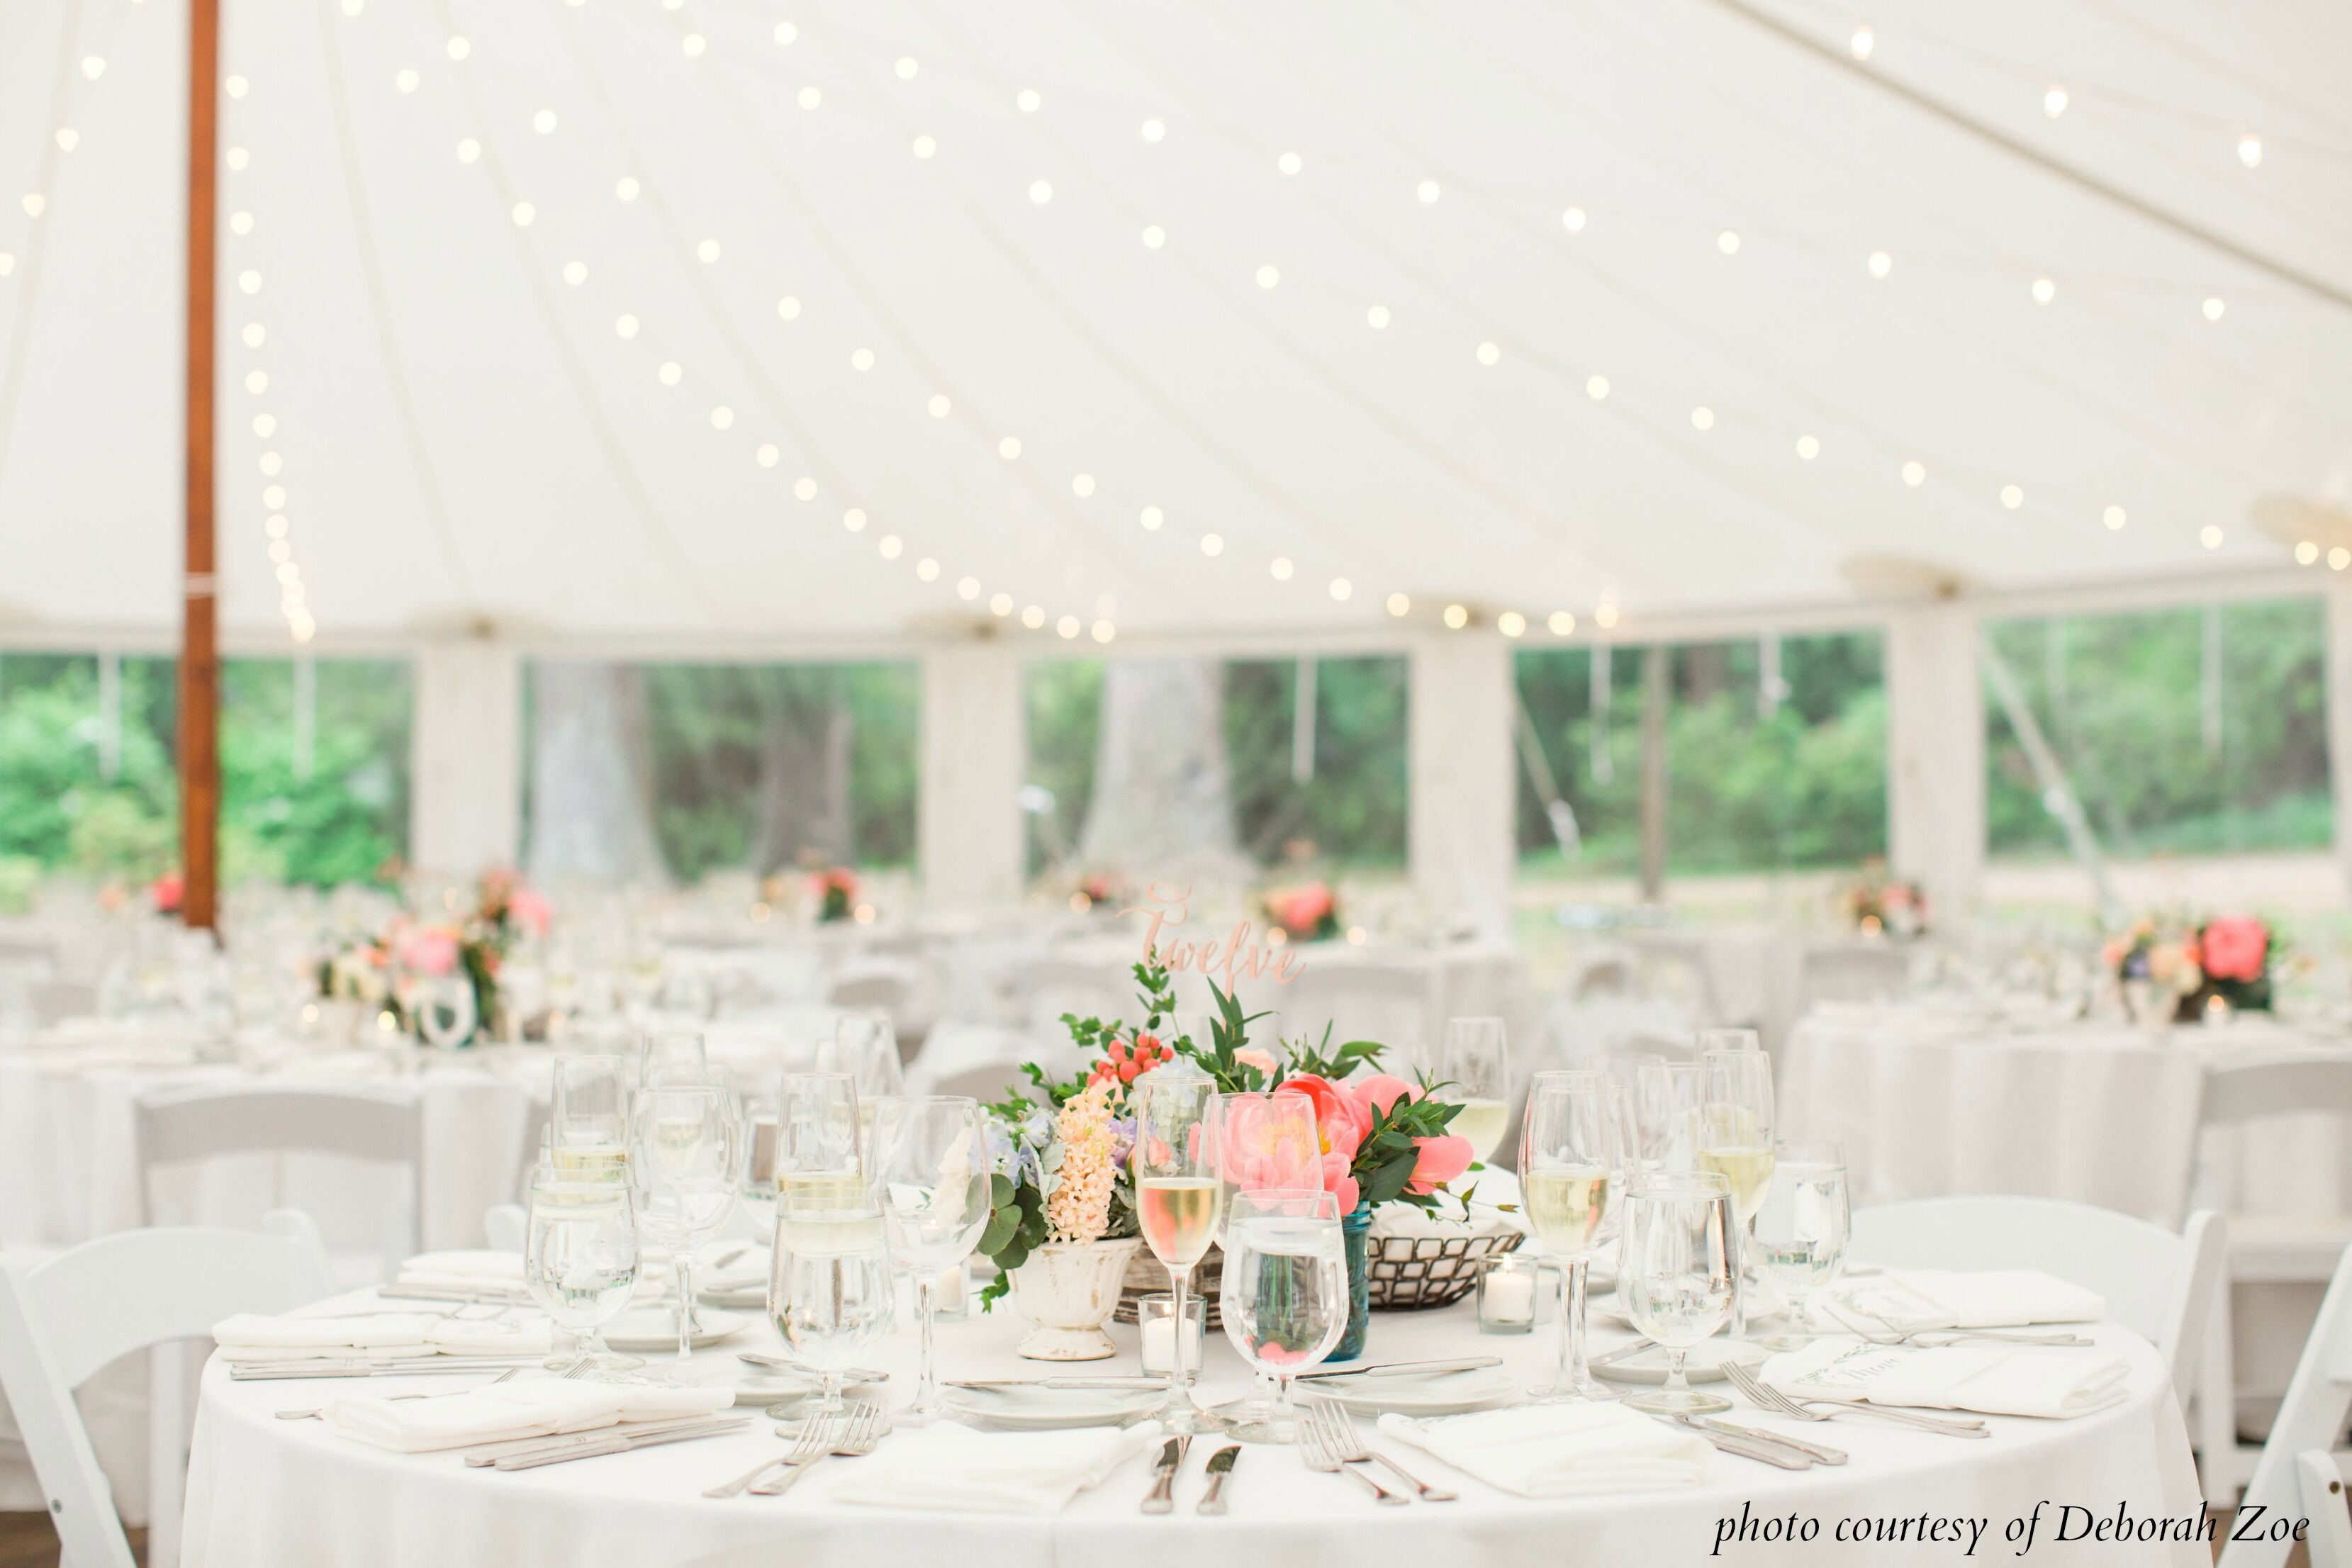 Outstanding Reception Halls For Weddings Ensign - Wedding Idea 2018 ...